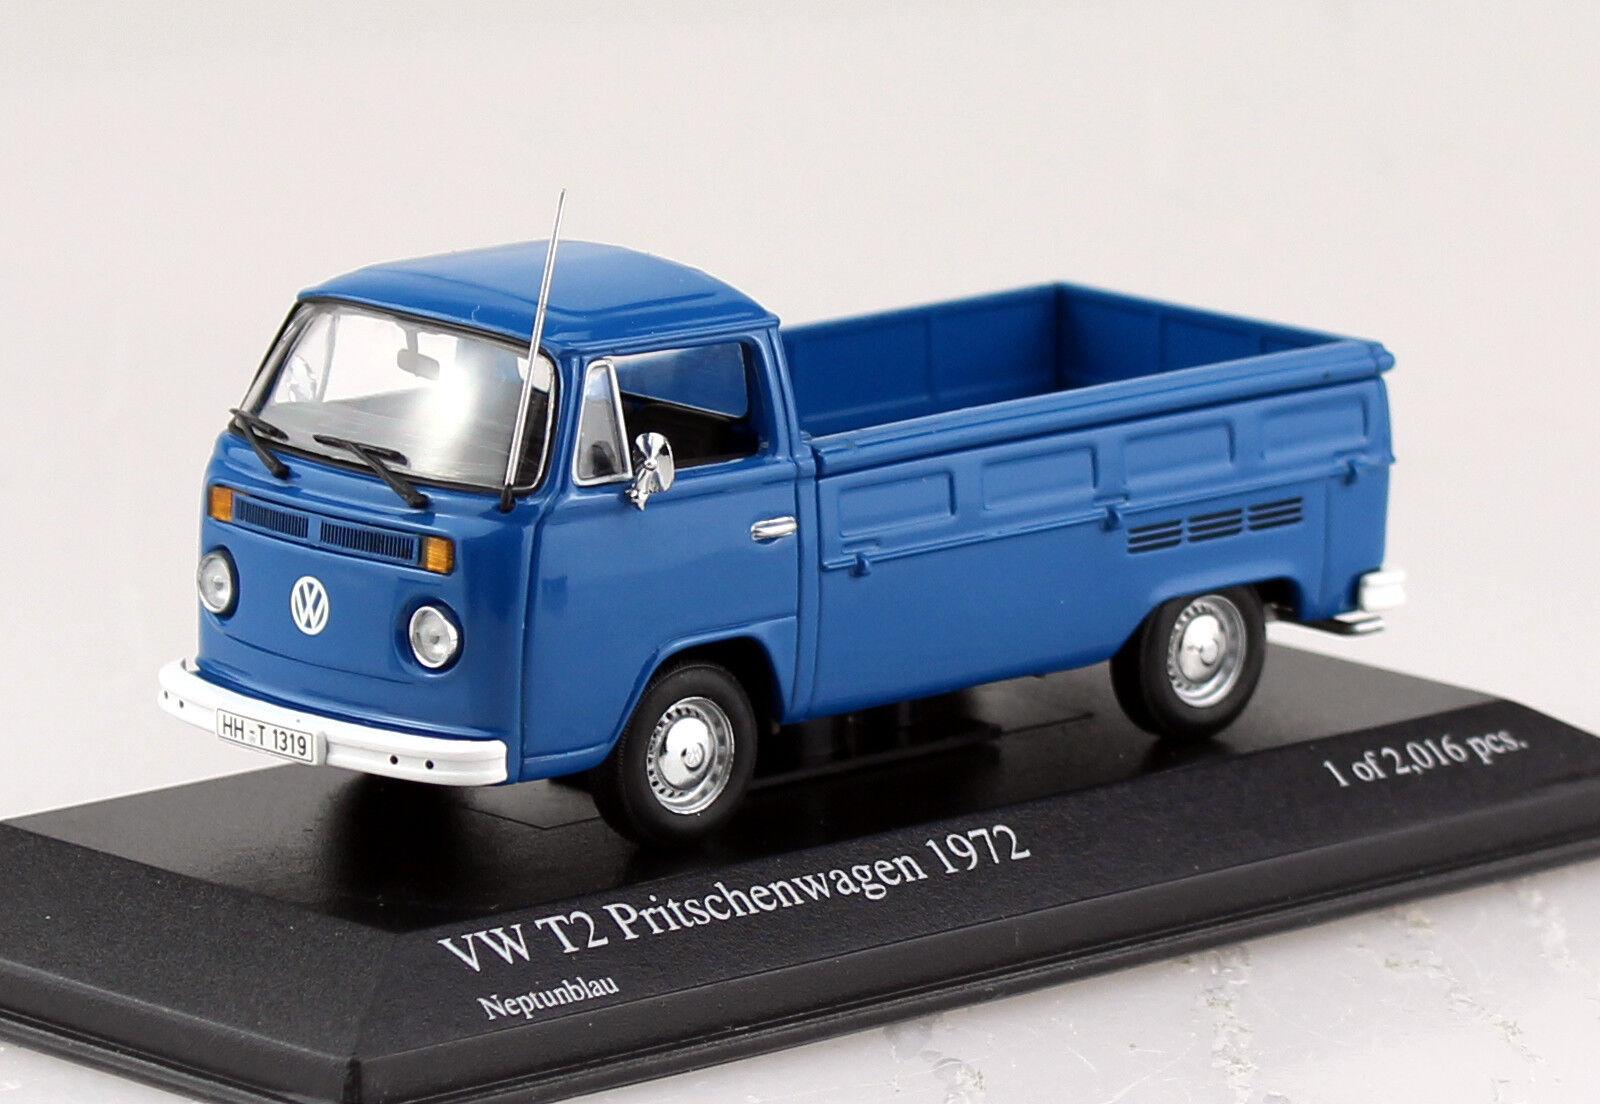 VW t2 camastro azul 1972 1 43 Minichamps maqueta de coche